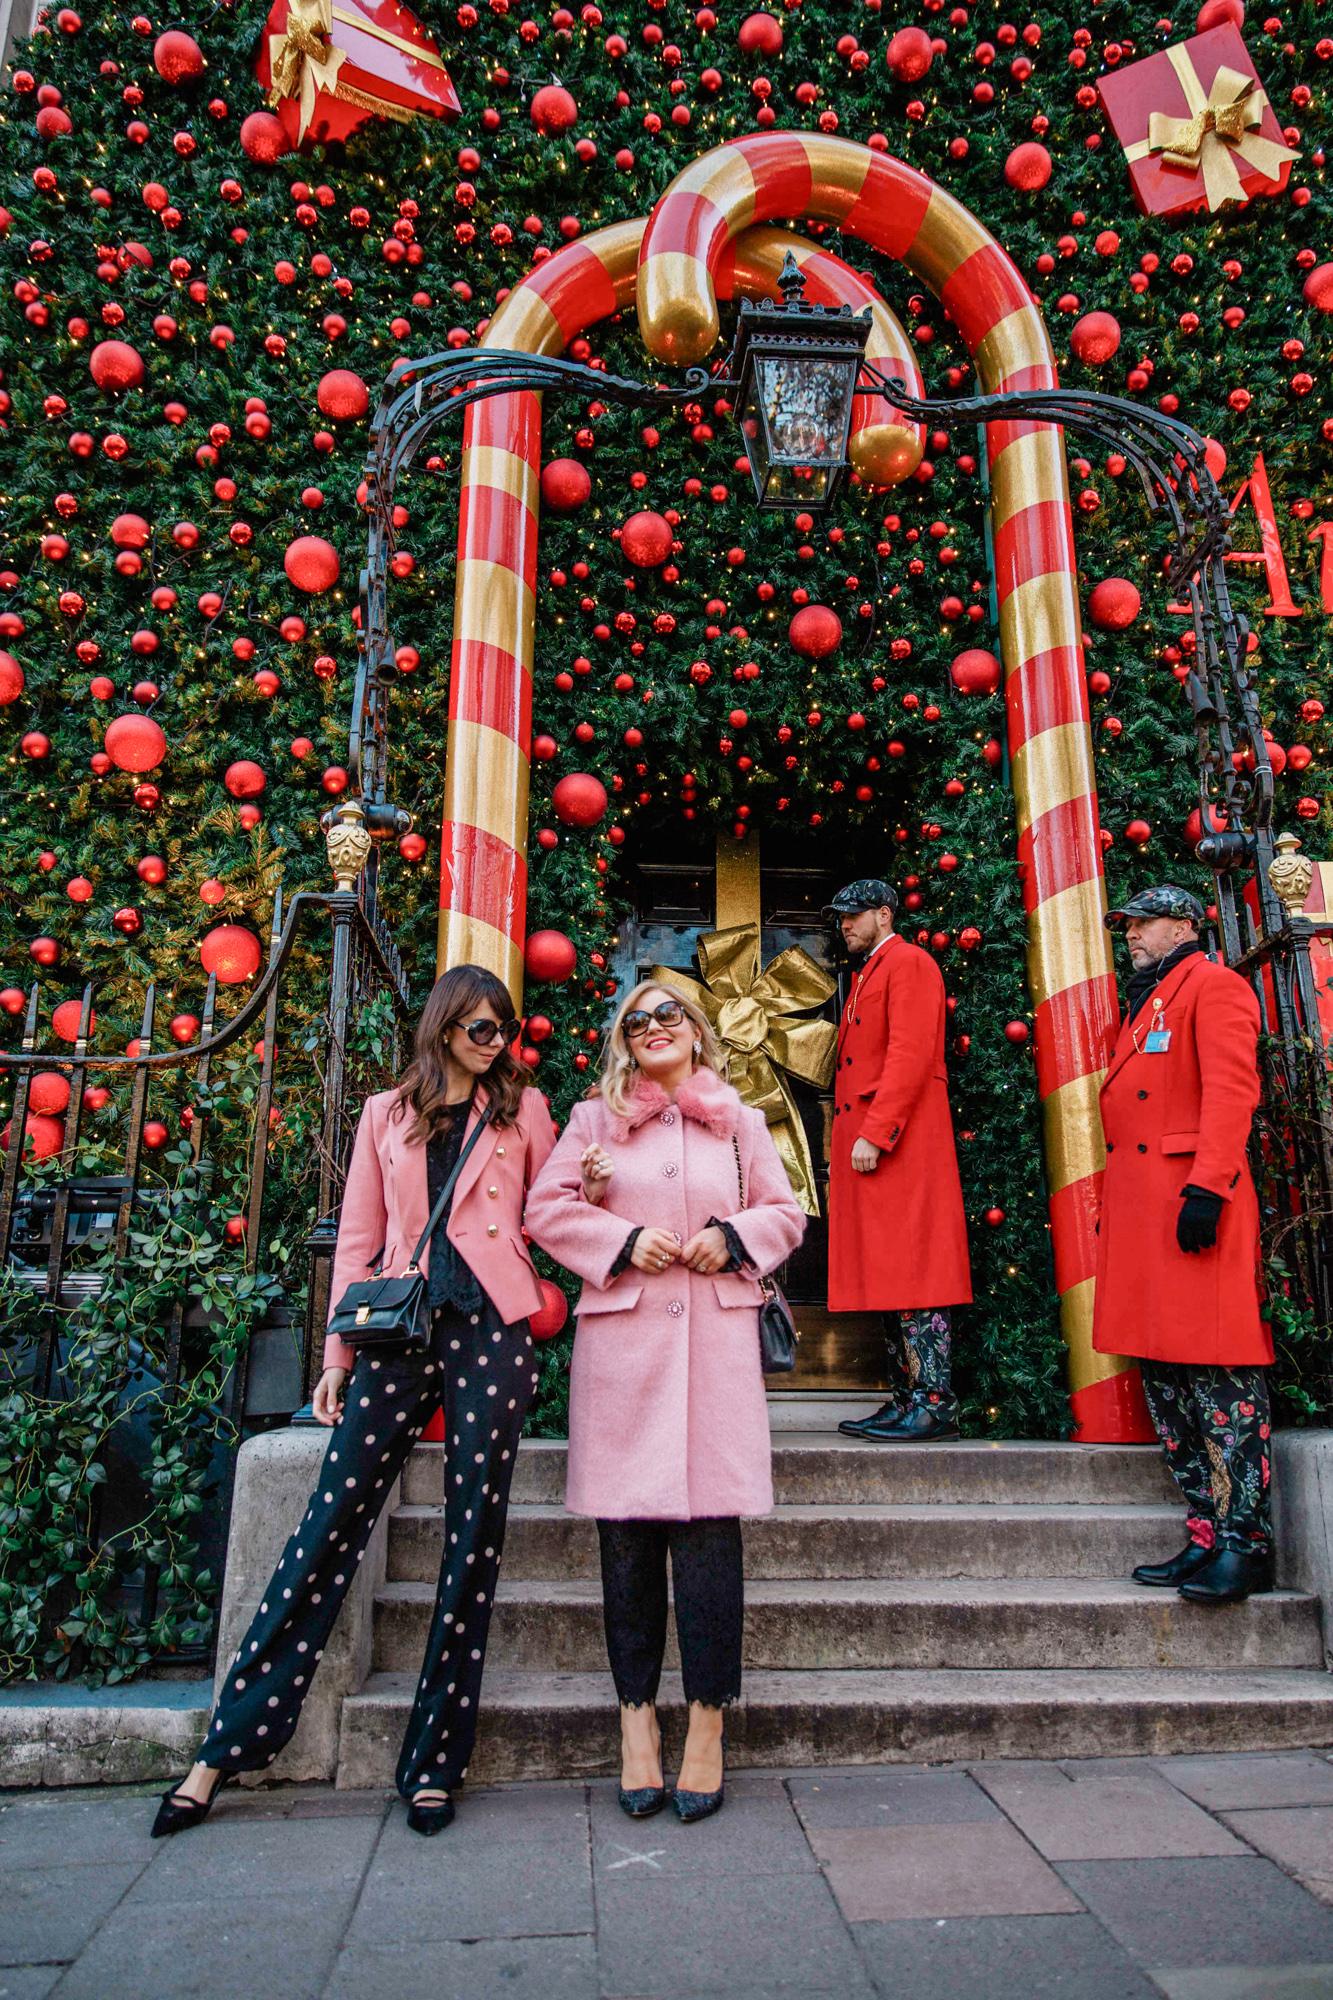 The Best Christmas Festive Decorations London-5.jpg